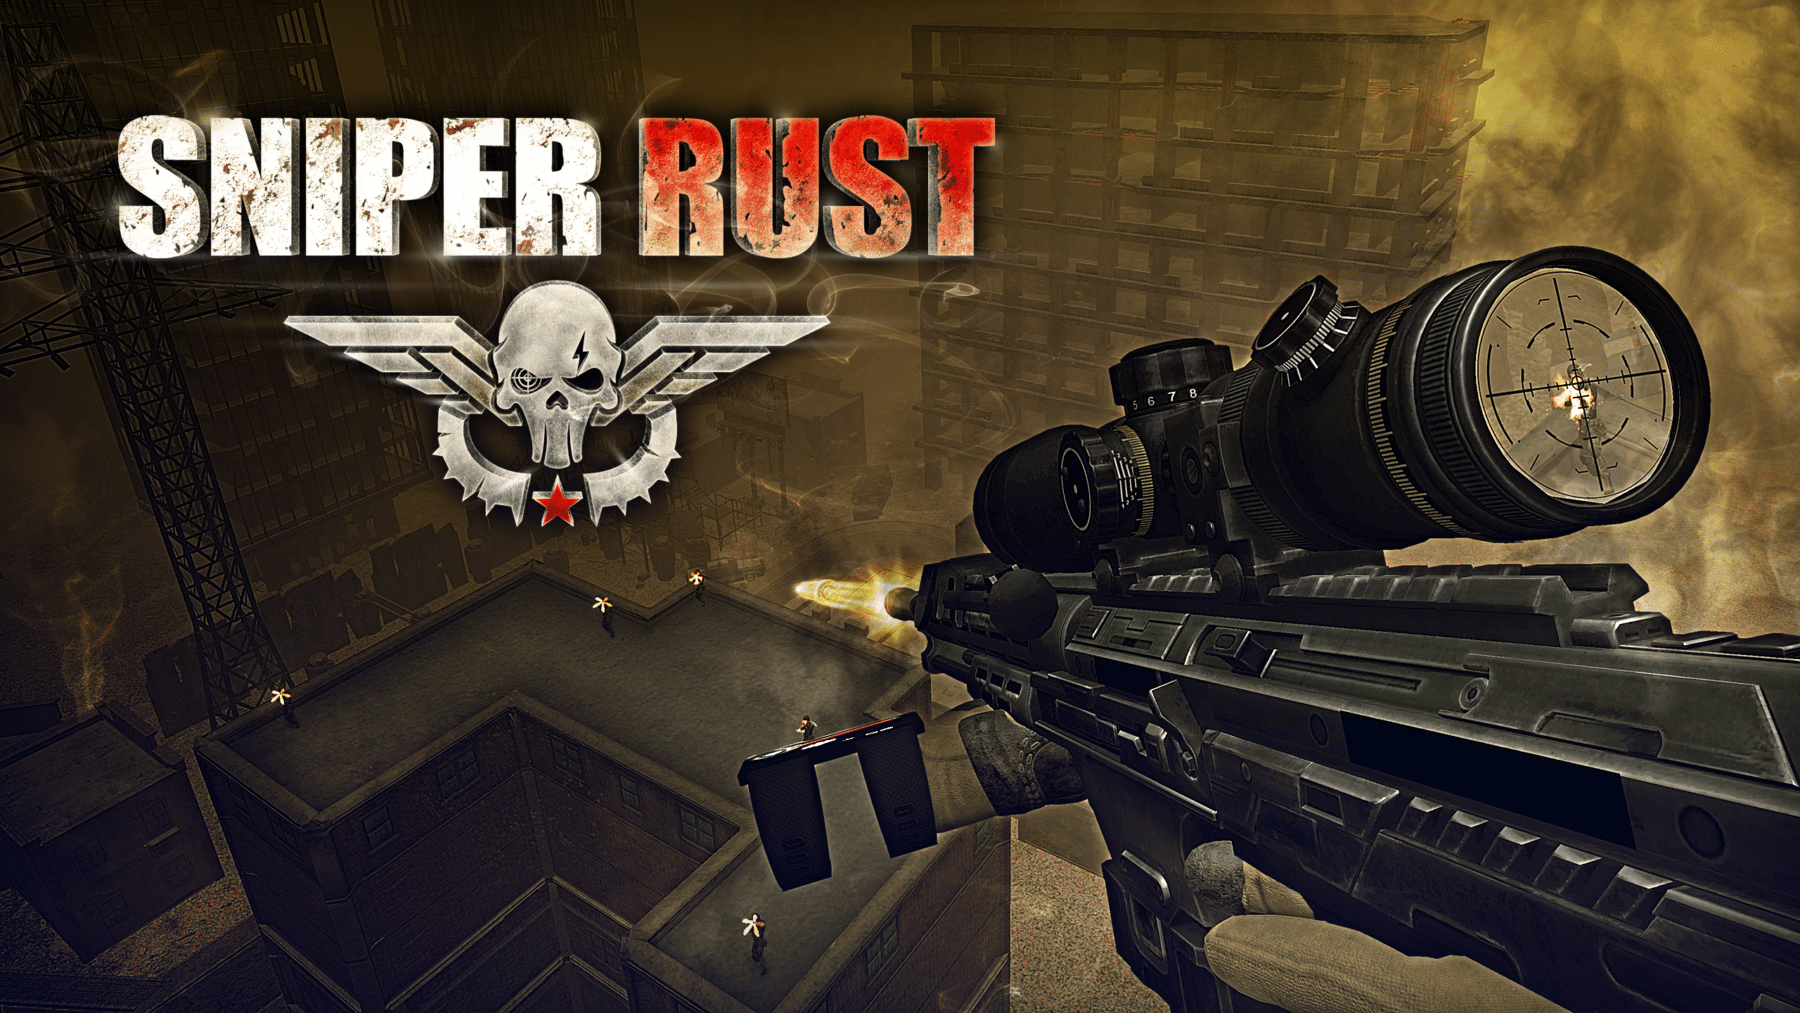 Sniper Rust VR llega a Oculus Store y Steam